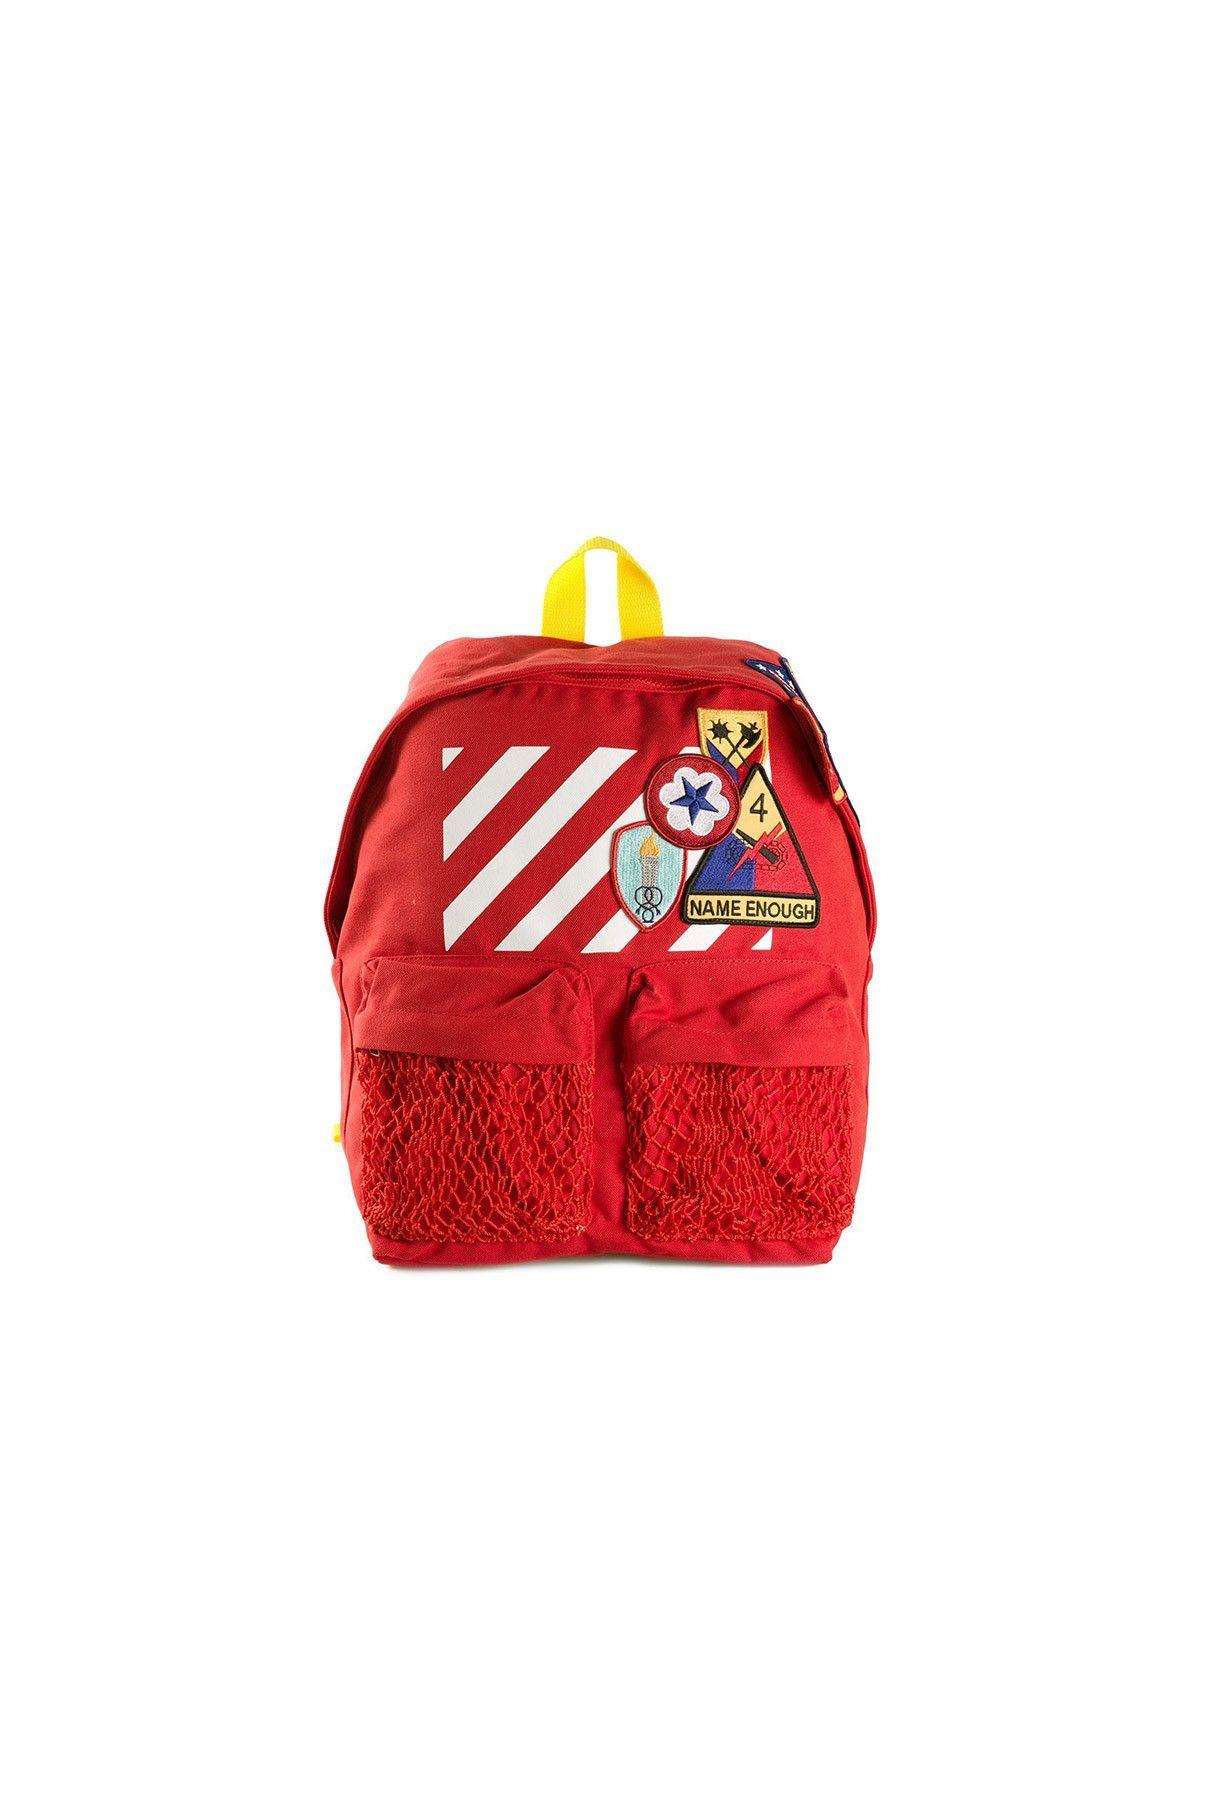 {Off-White / 04 bag / 04 backpack} Canvas Backpack